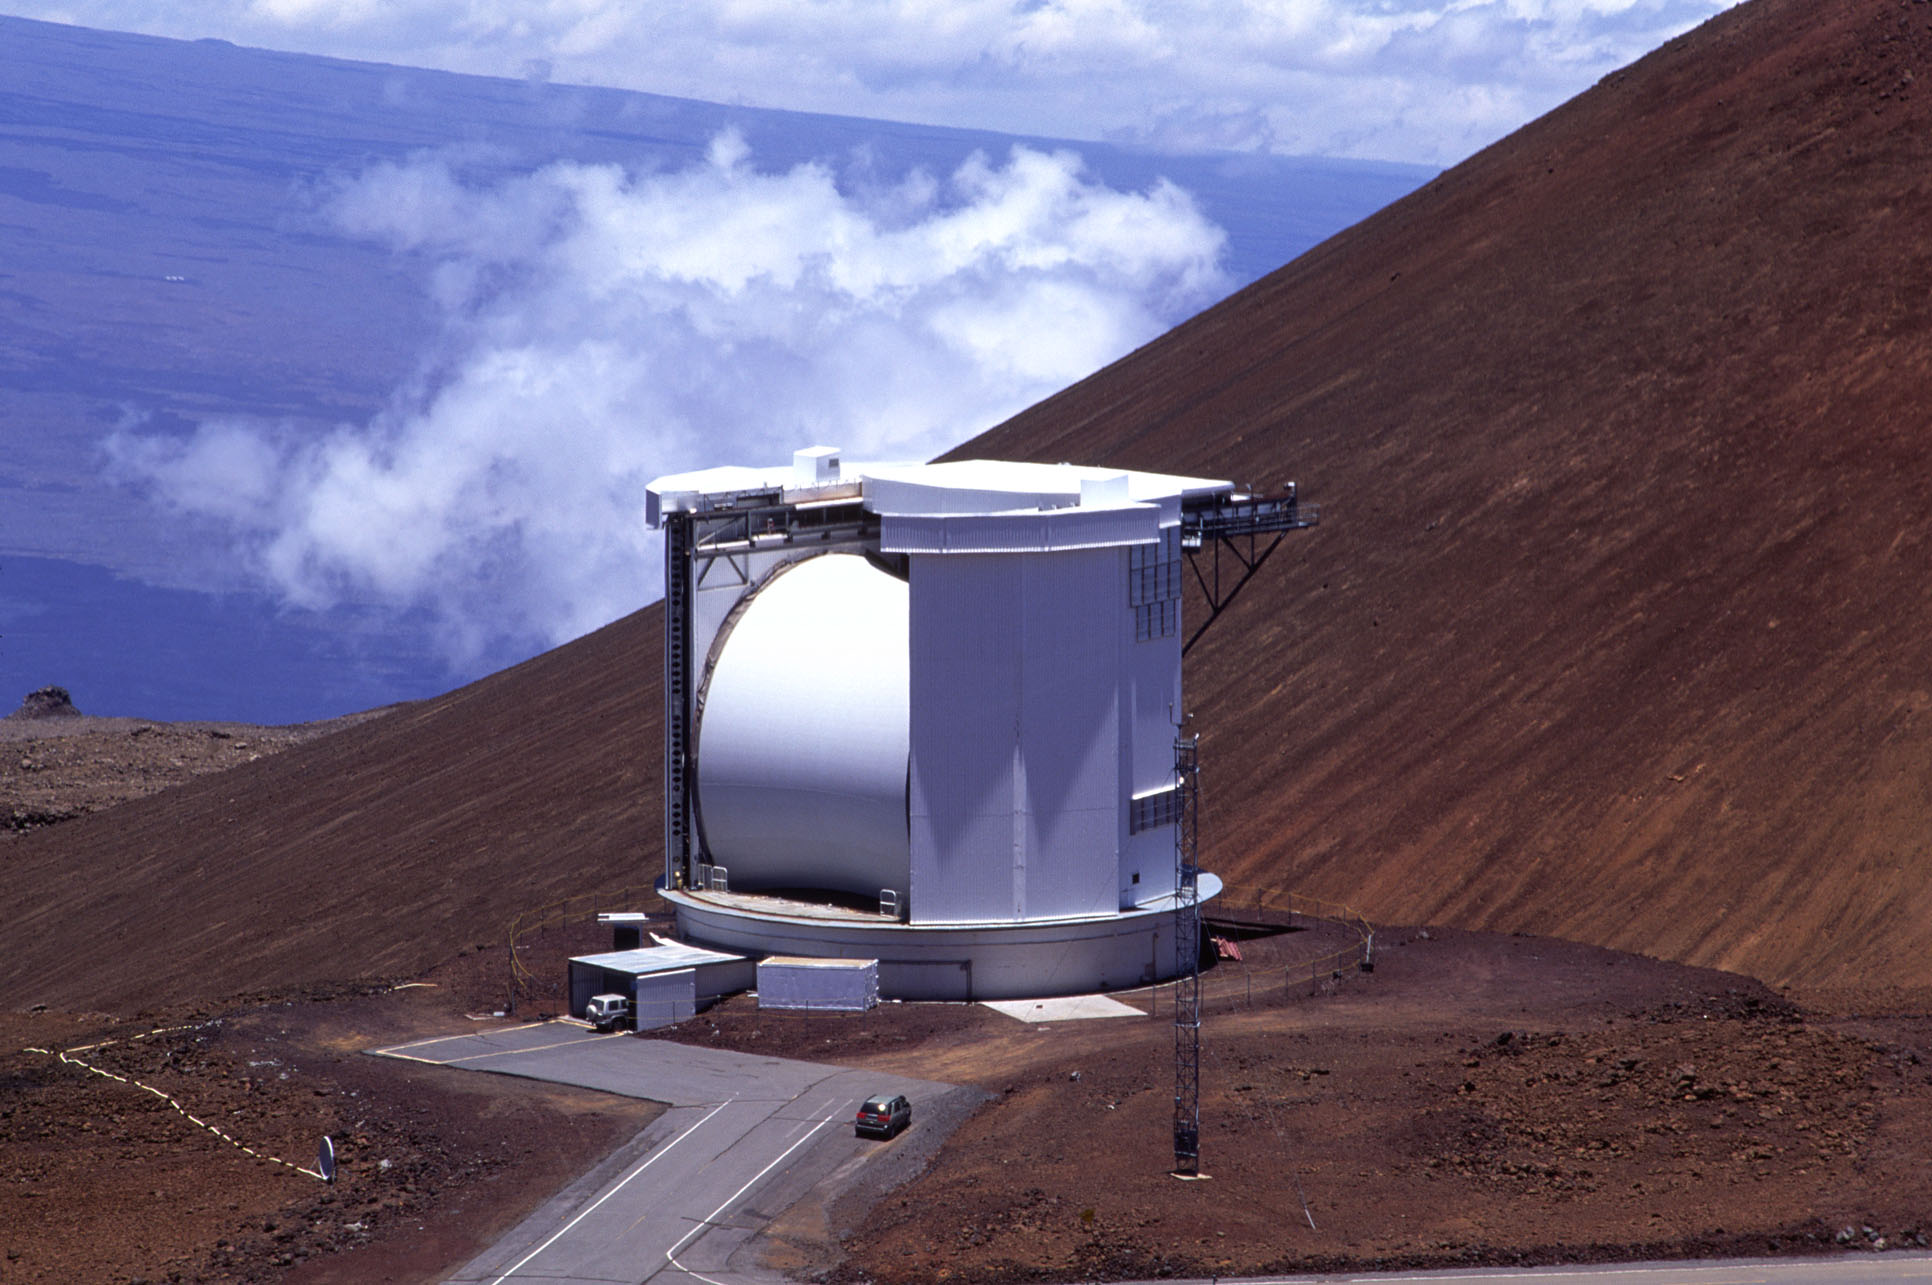 james clerk maxwell telescope - HD1932×1285